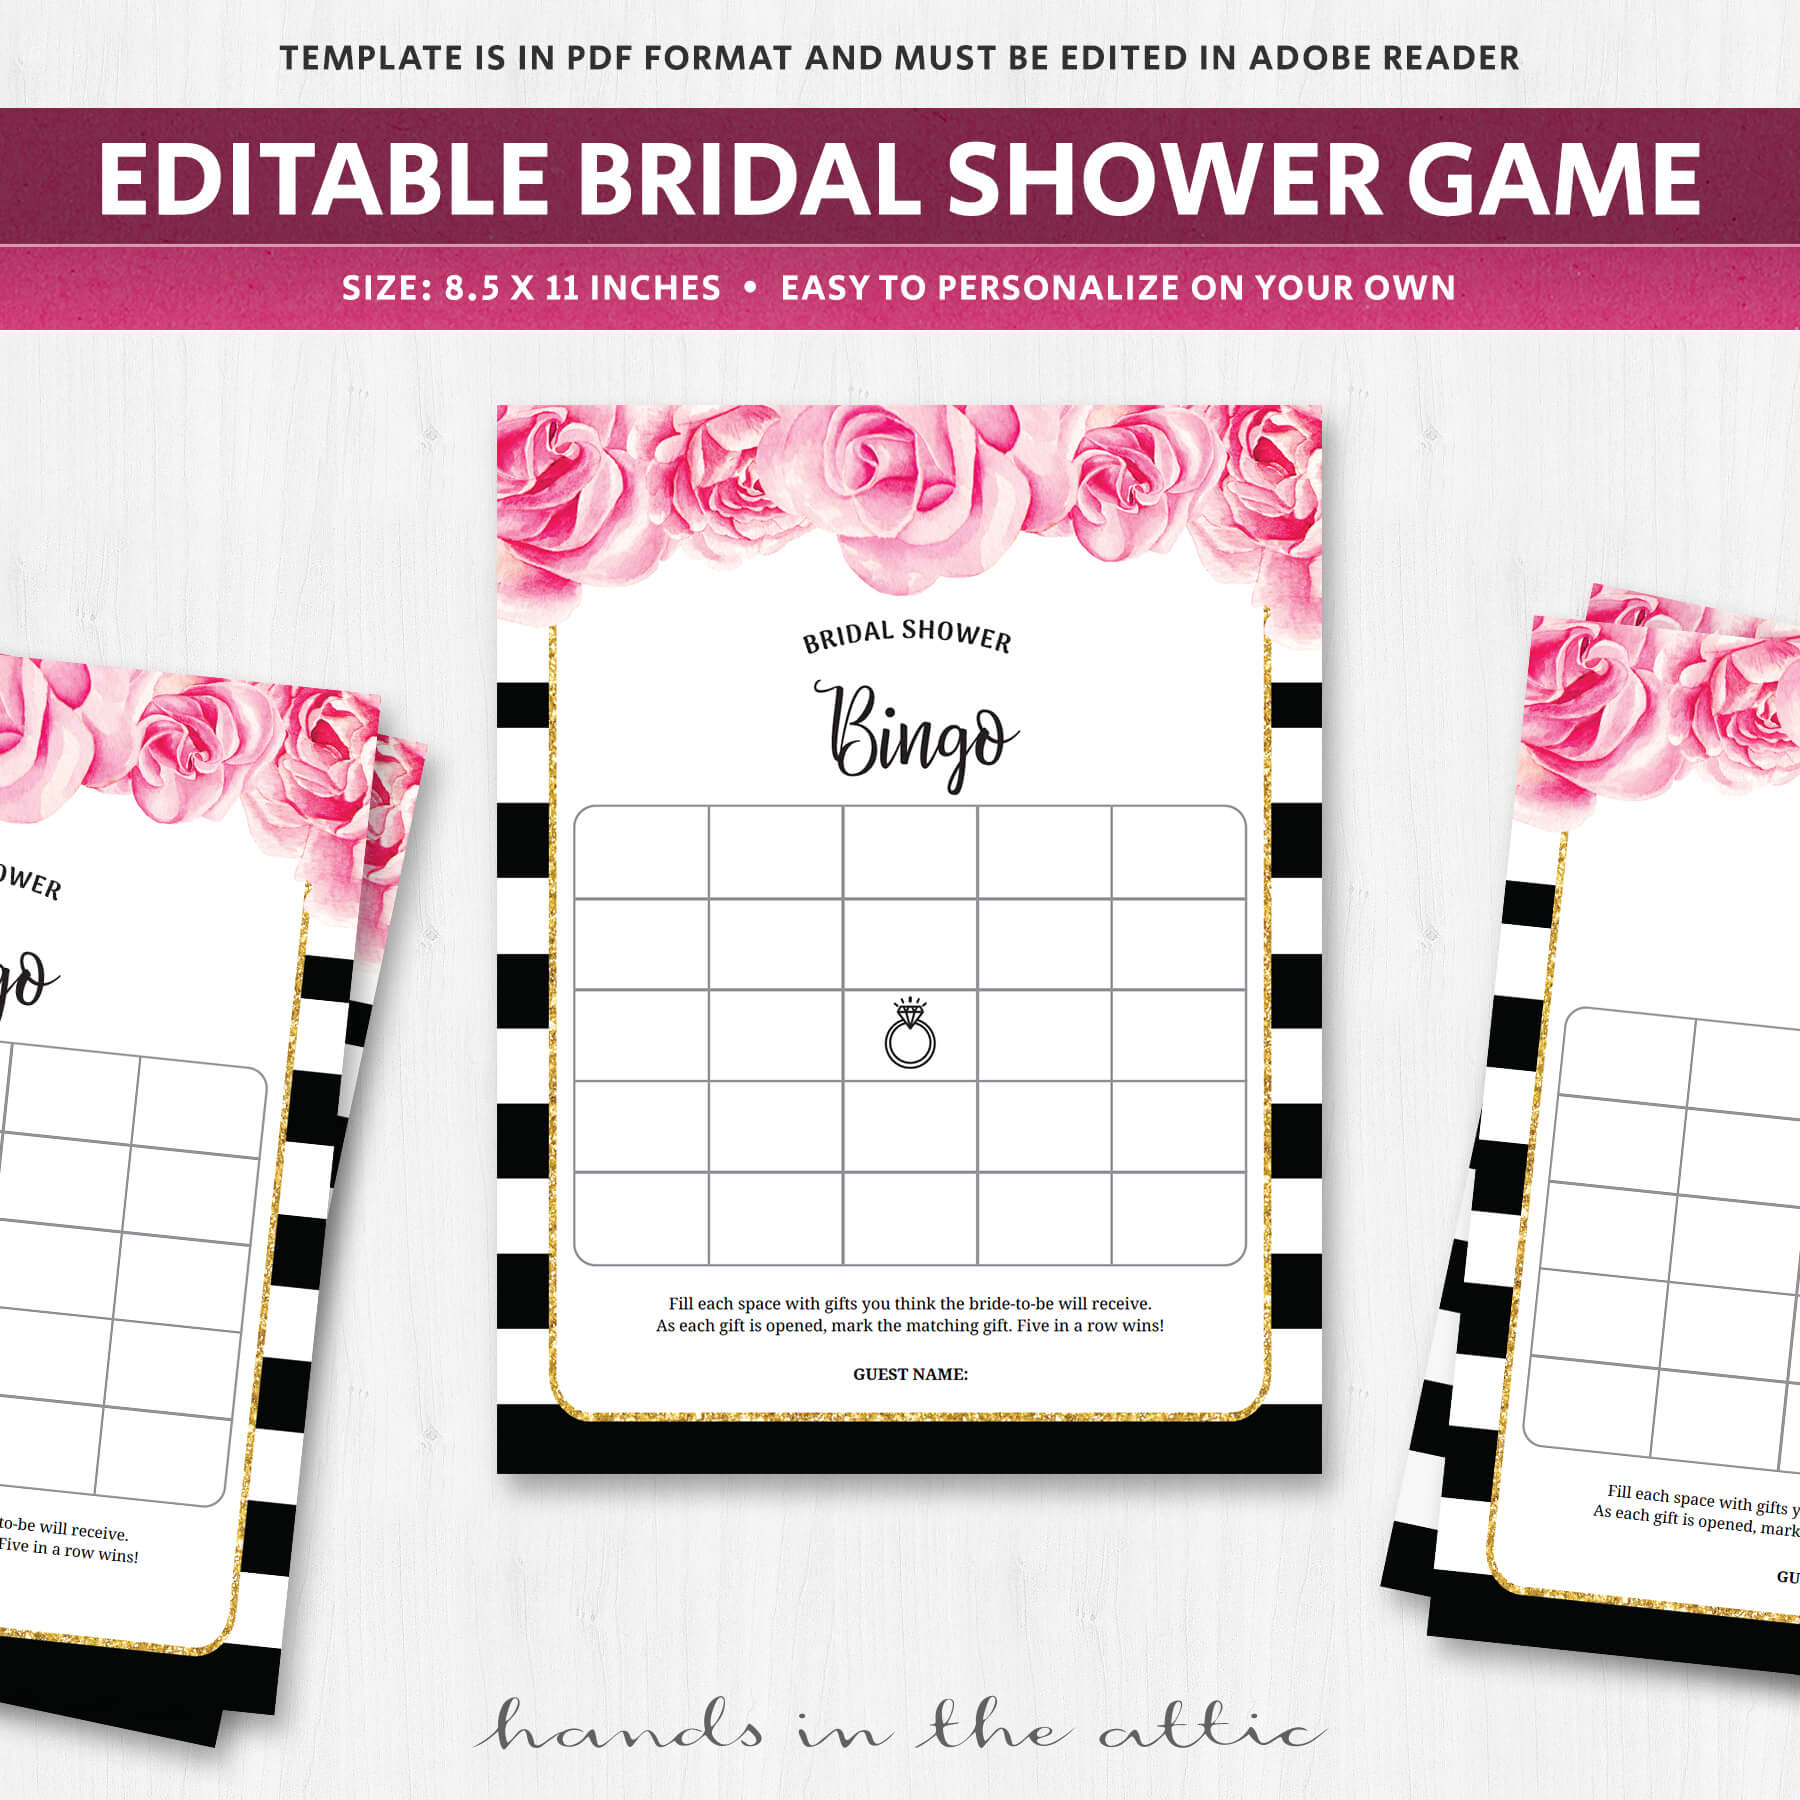 Bridal Shower Bingo Template - Black and White | Printable ...